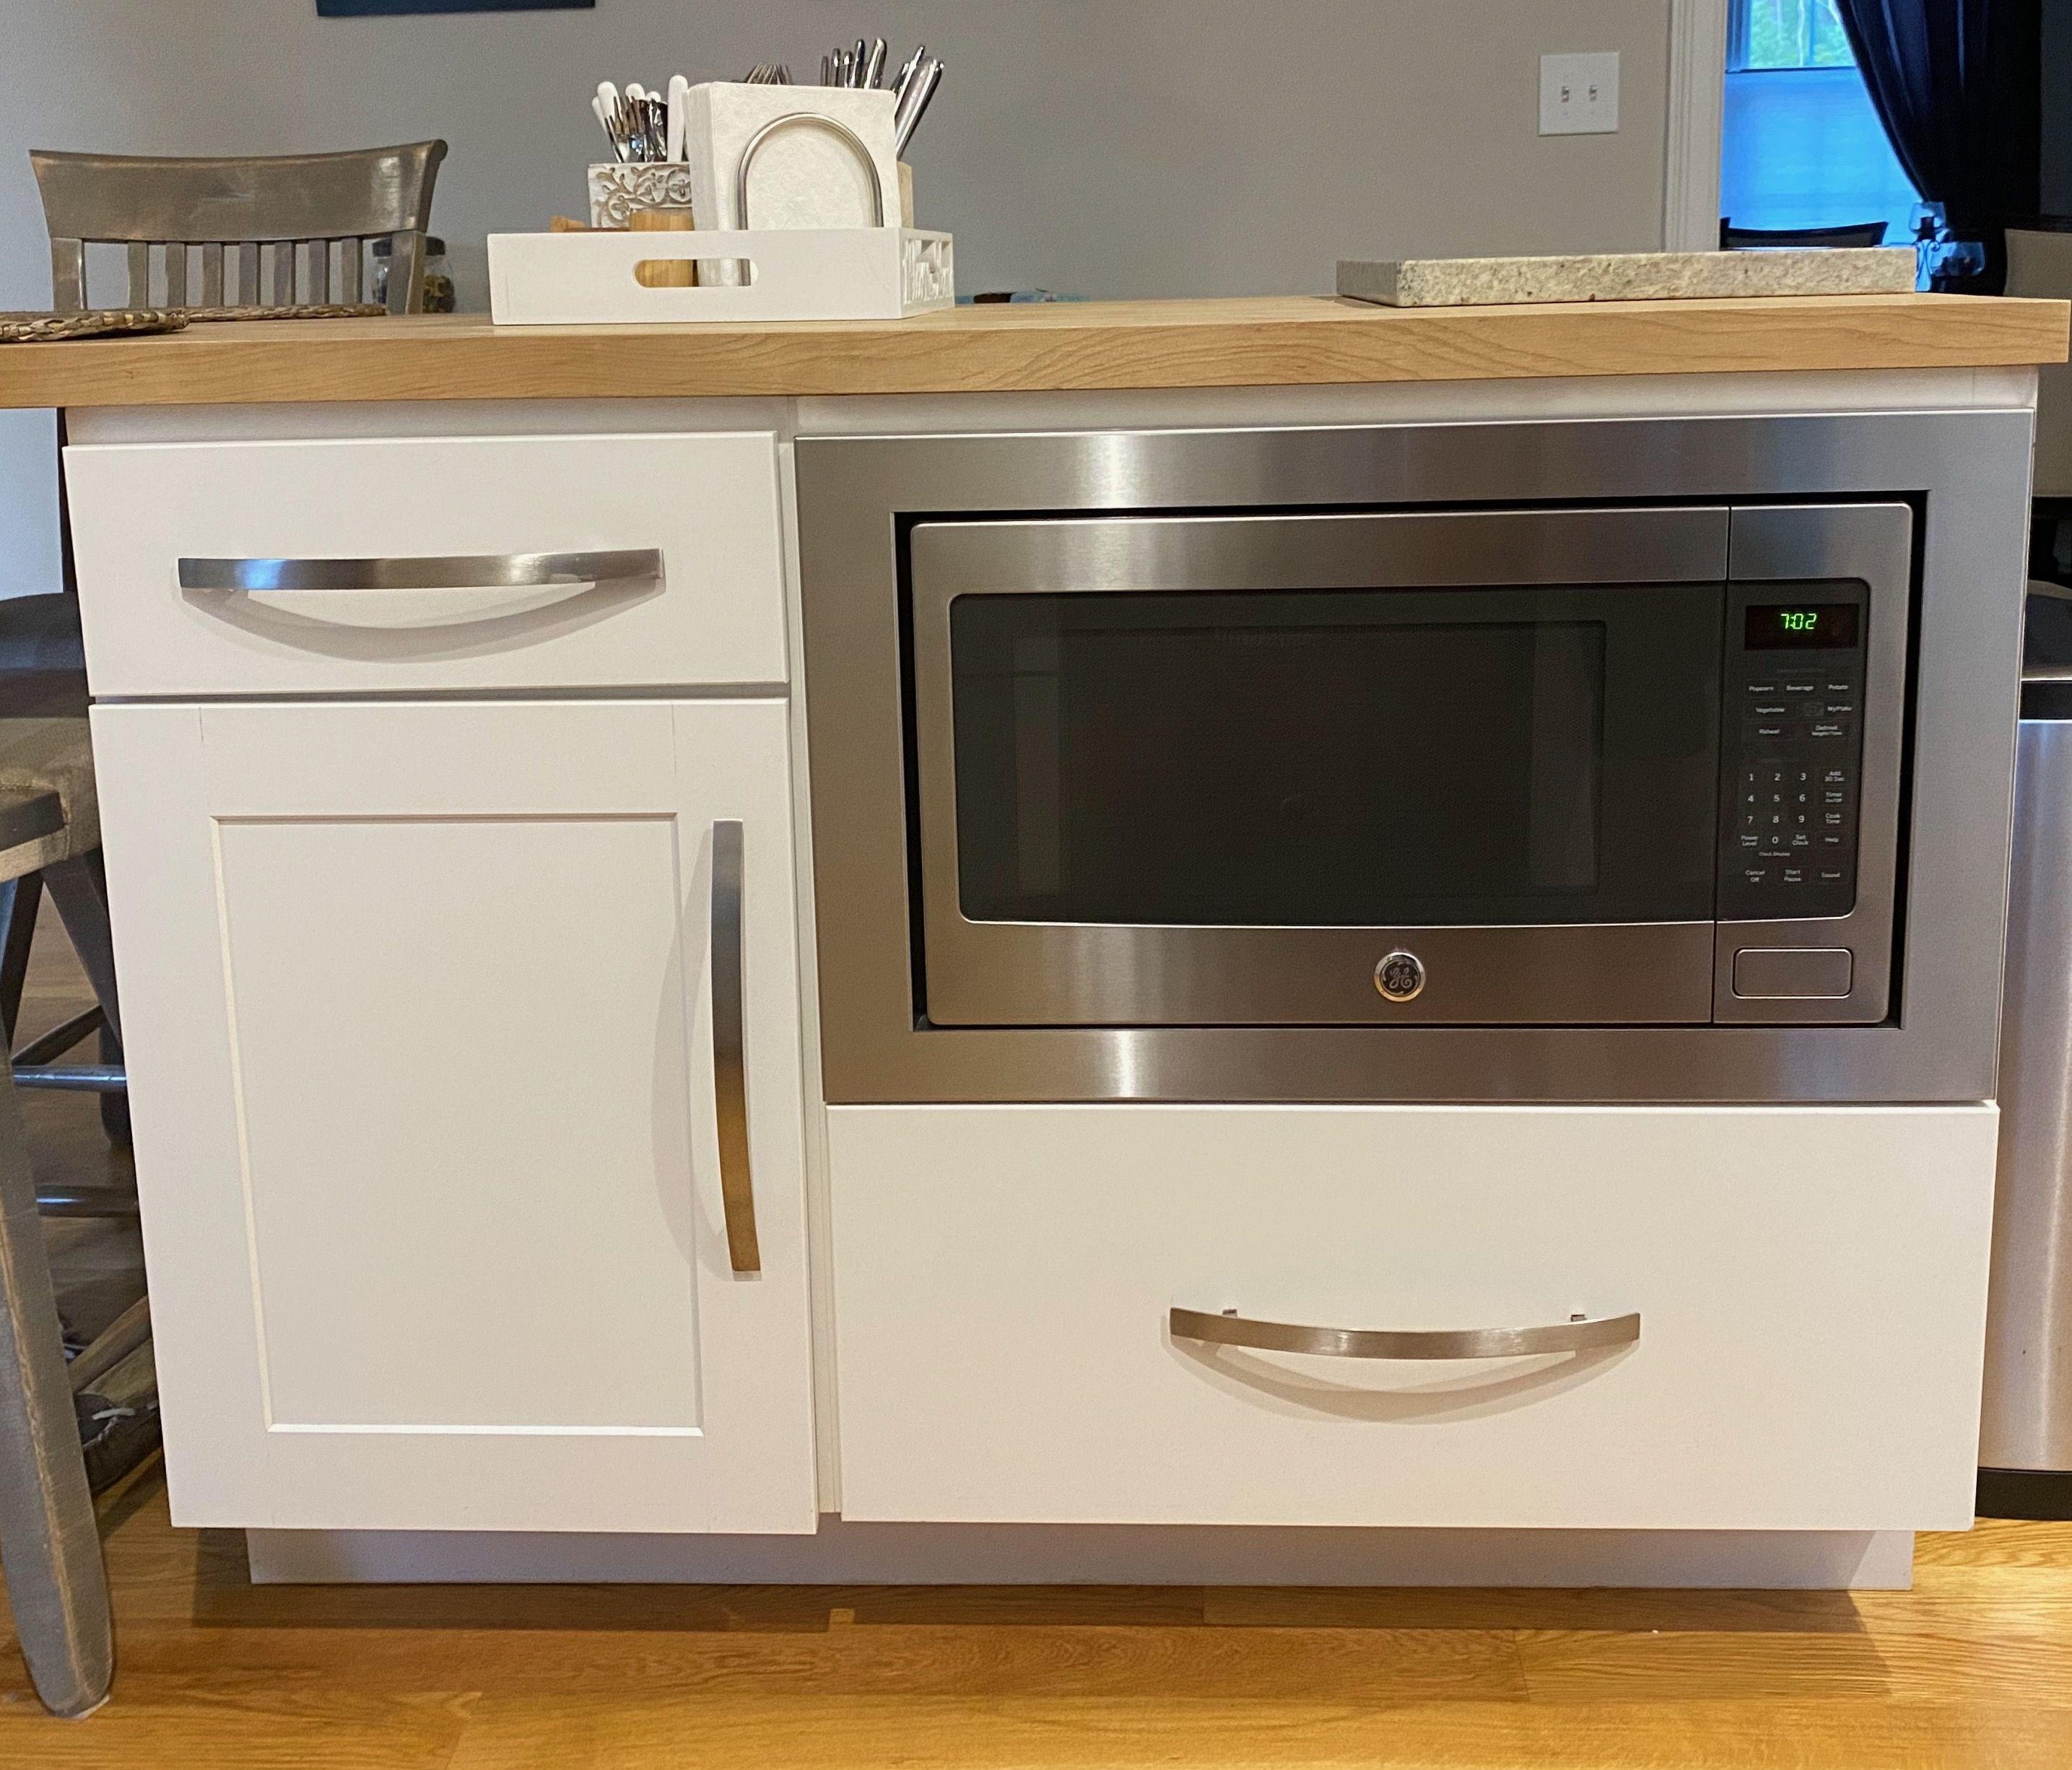 30 Custom Microwave Trim Kit For A Ge